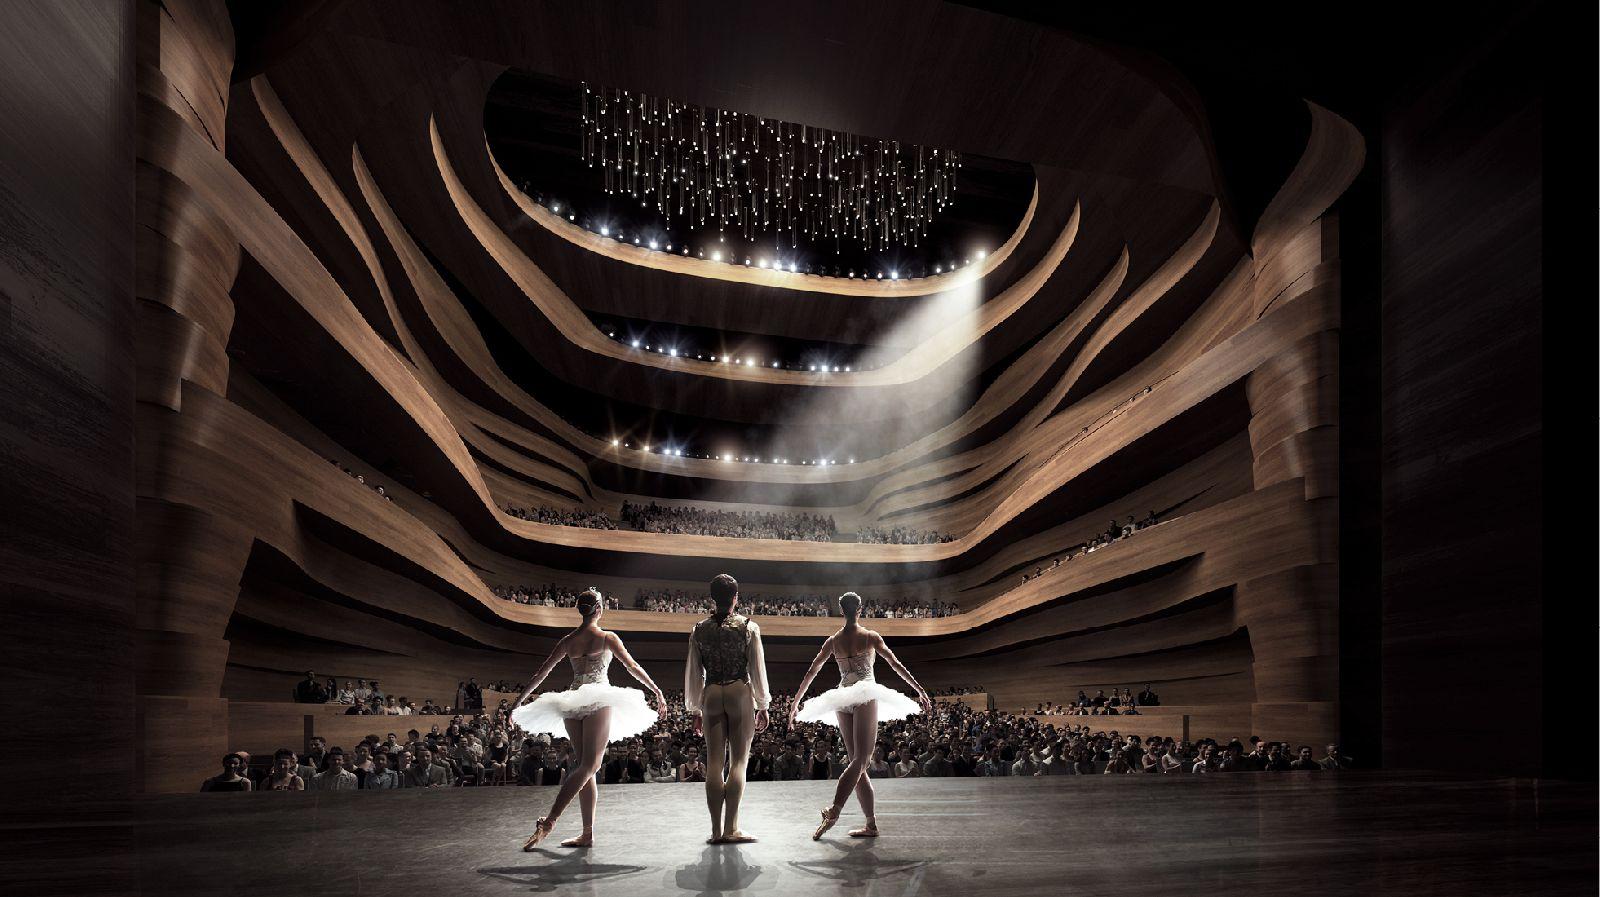 Nanchang Poly Grand Theatre